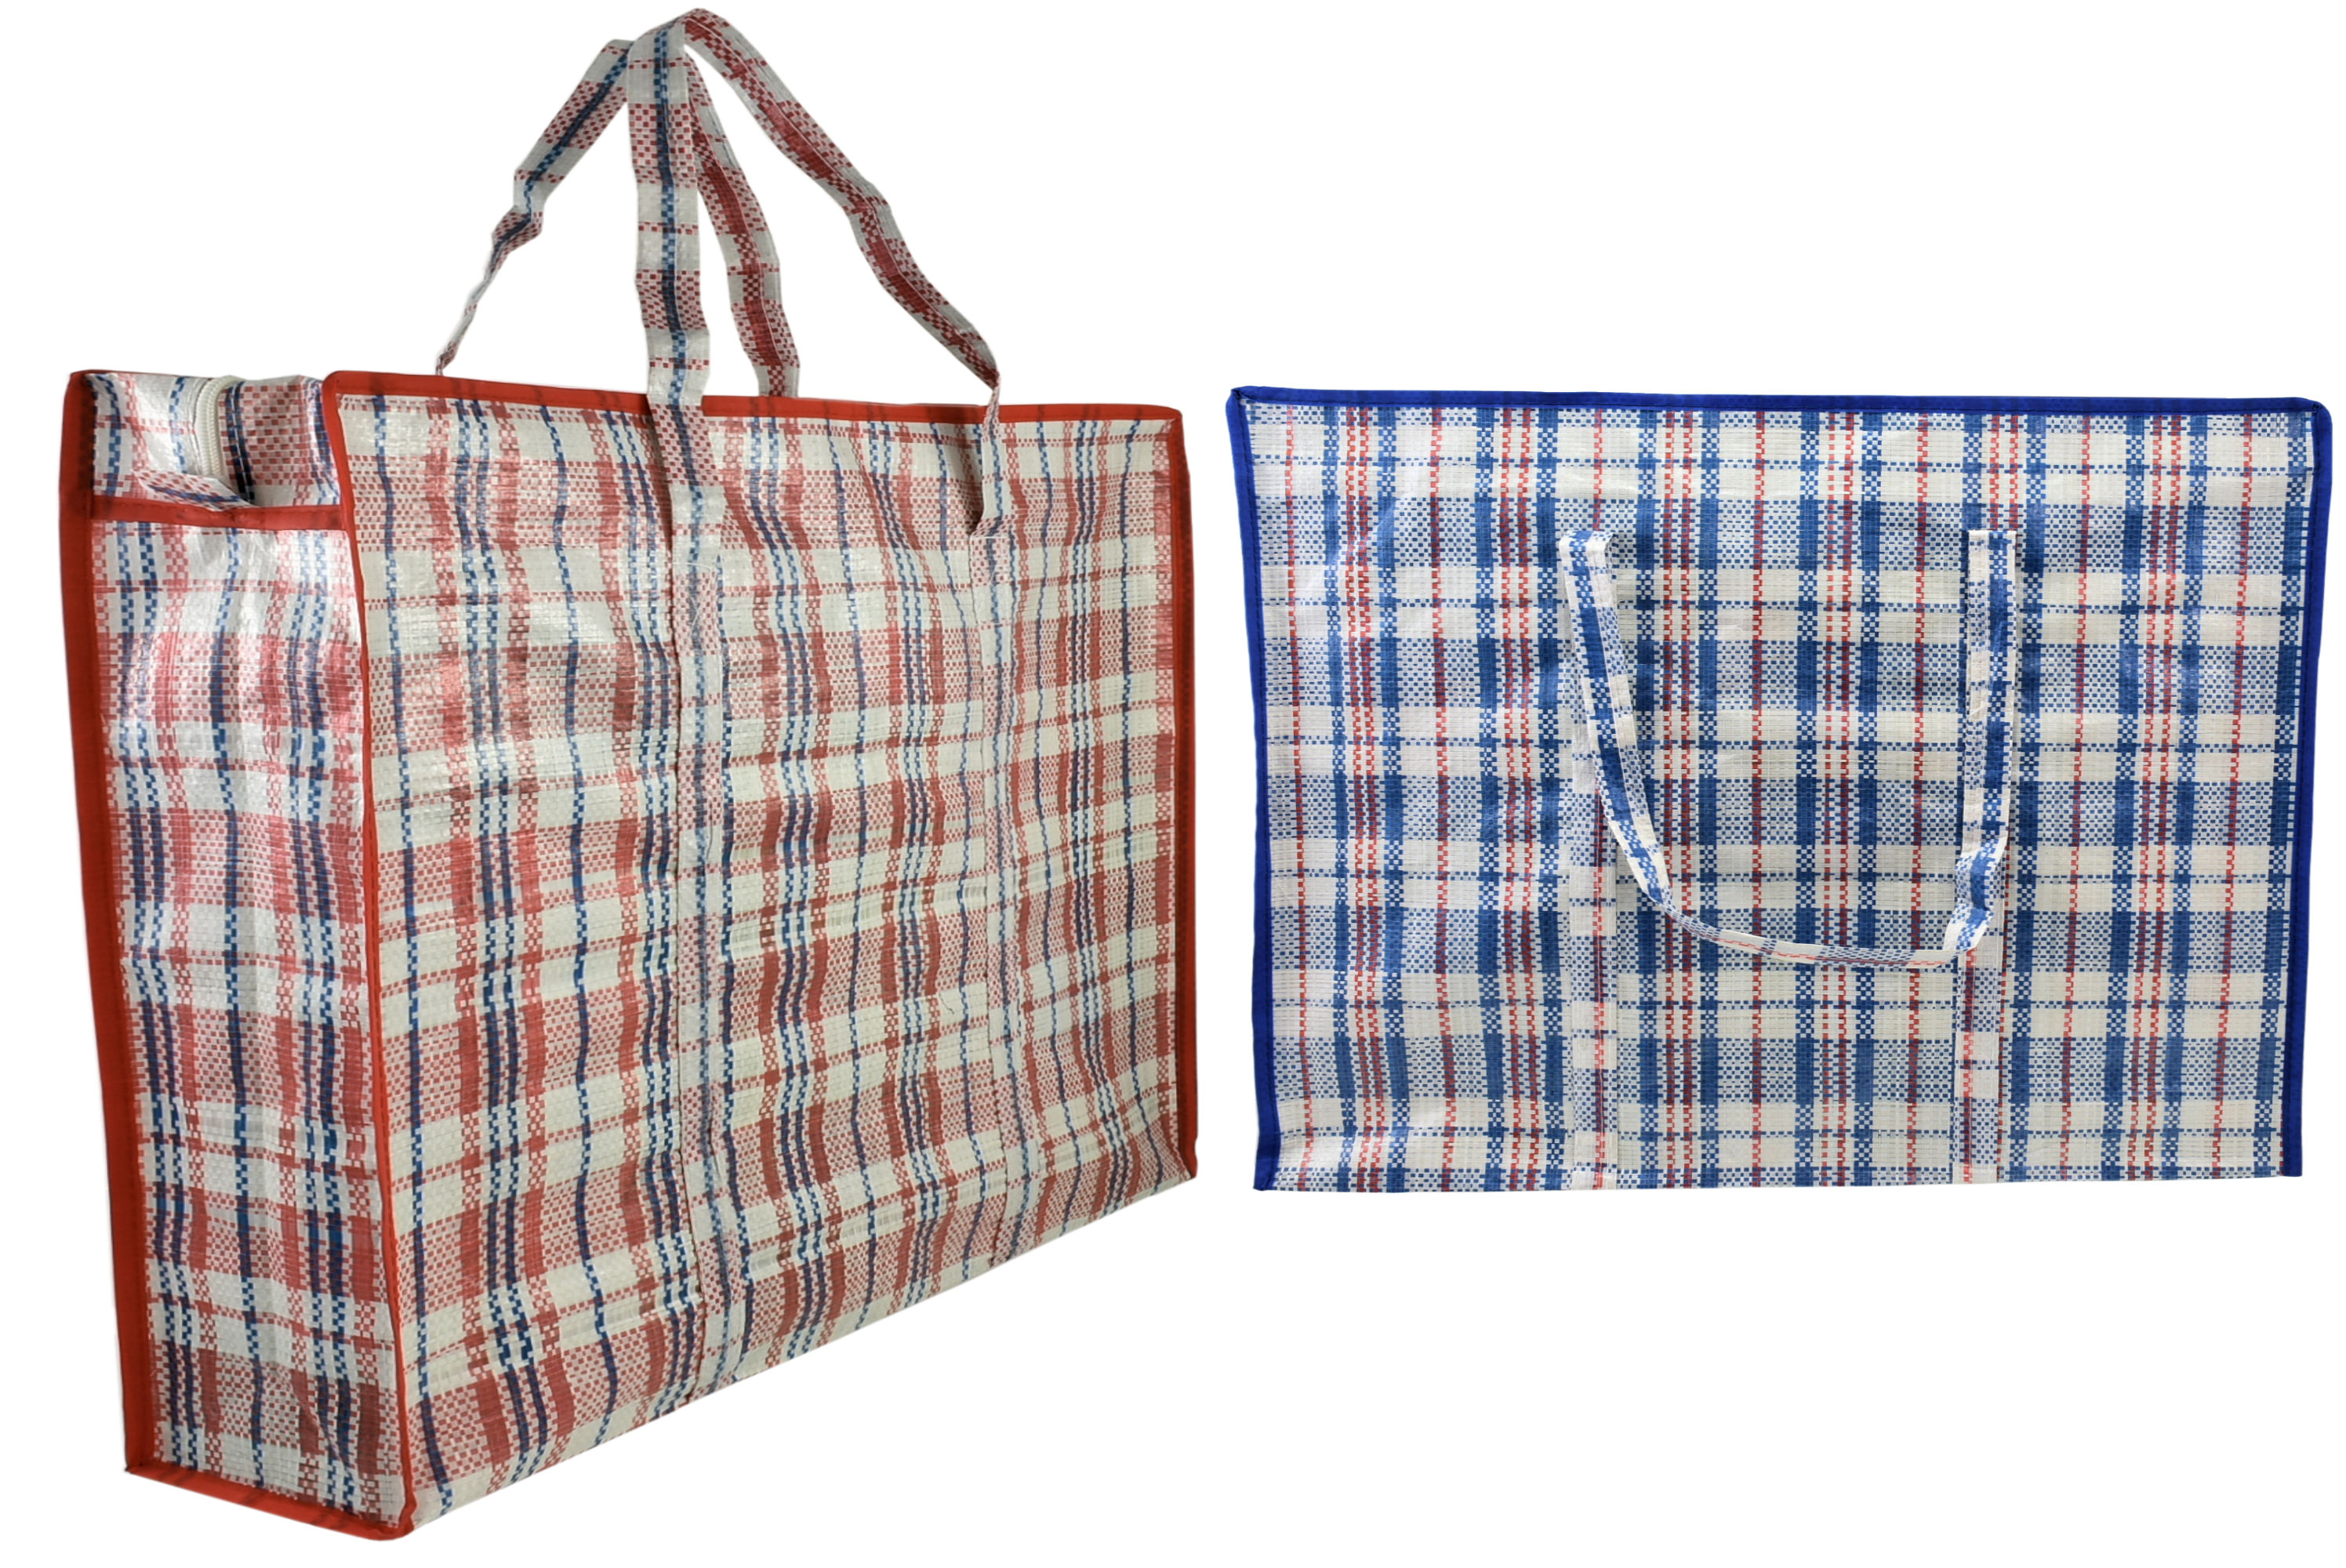 50x50x13cm Striped Shopping Bag 95gm 2 Asst Red & Blue